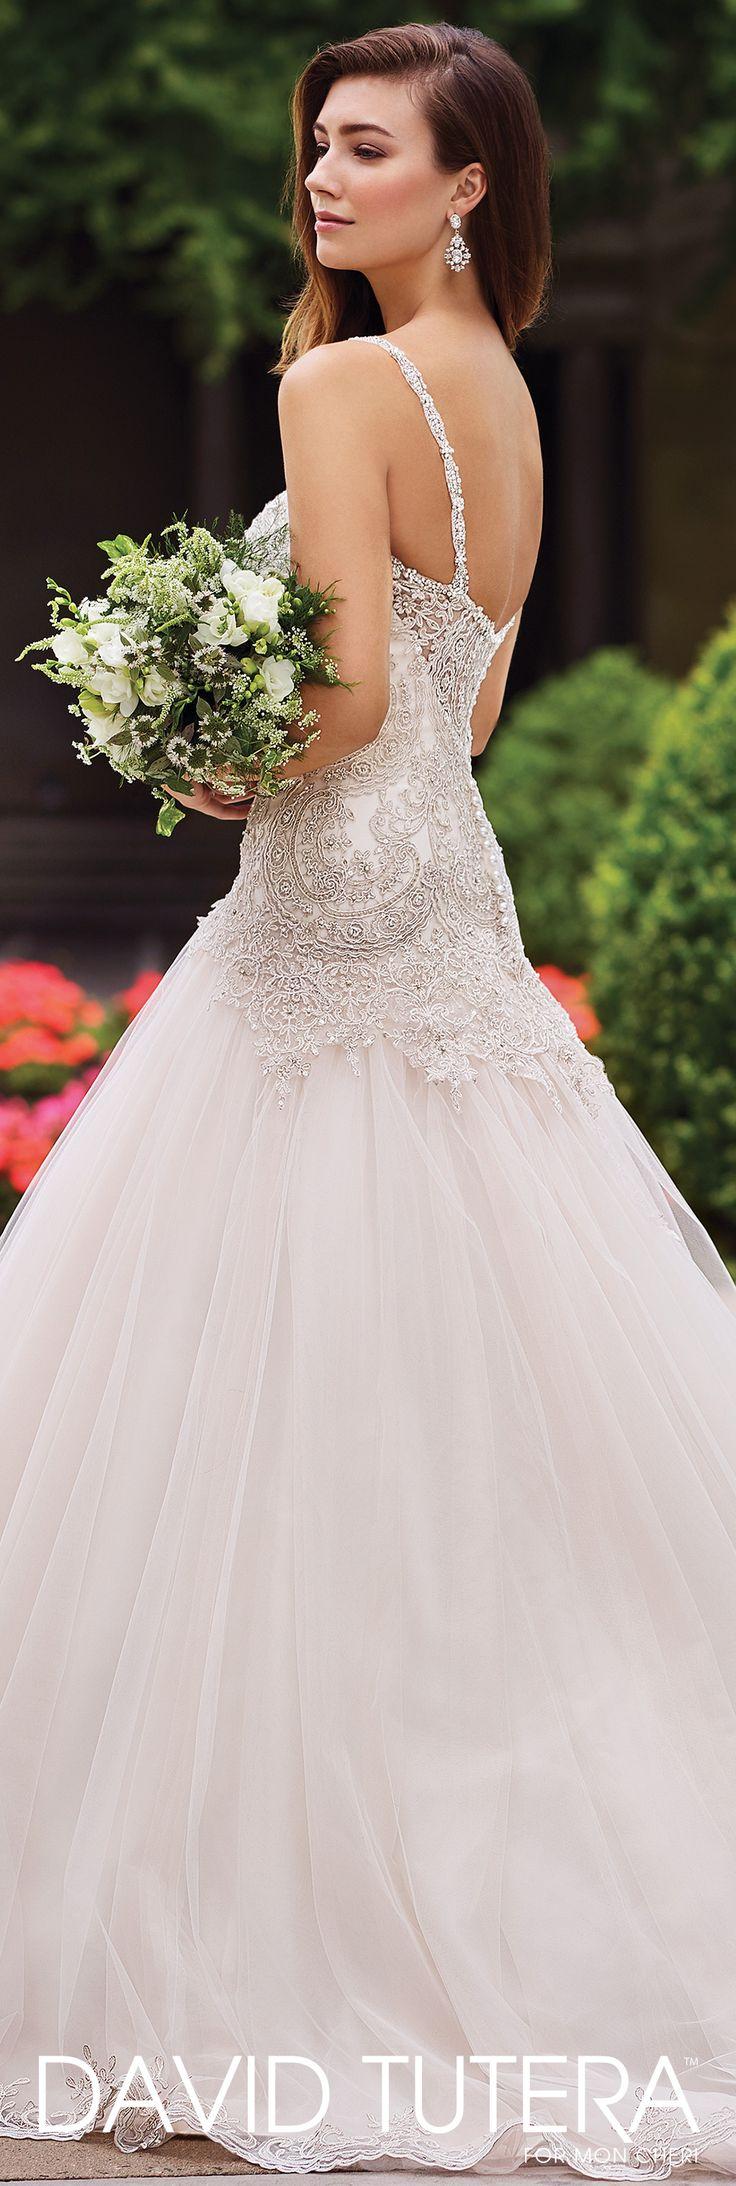 Best 25+ Drop waist wedding dress ideas on Pinterest | Sweetheart ...